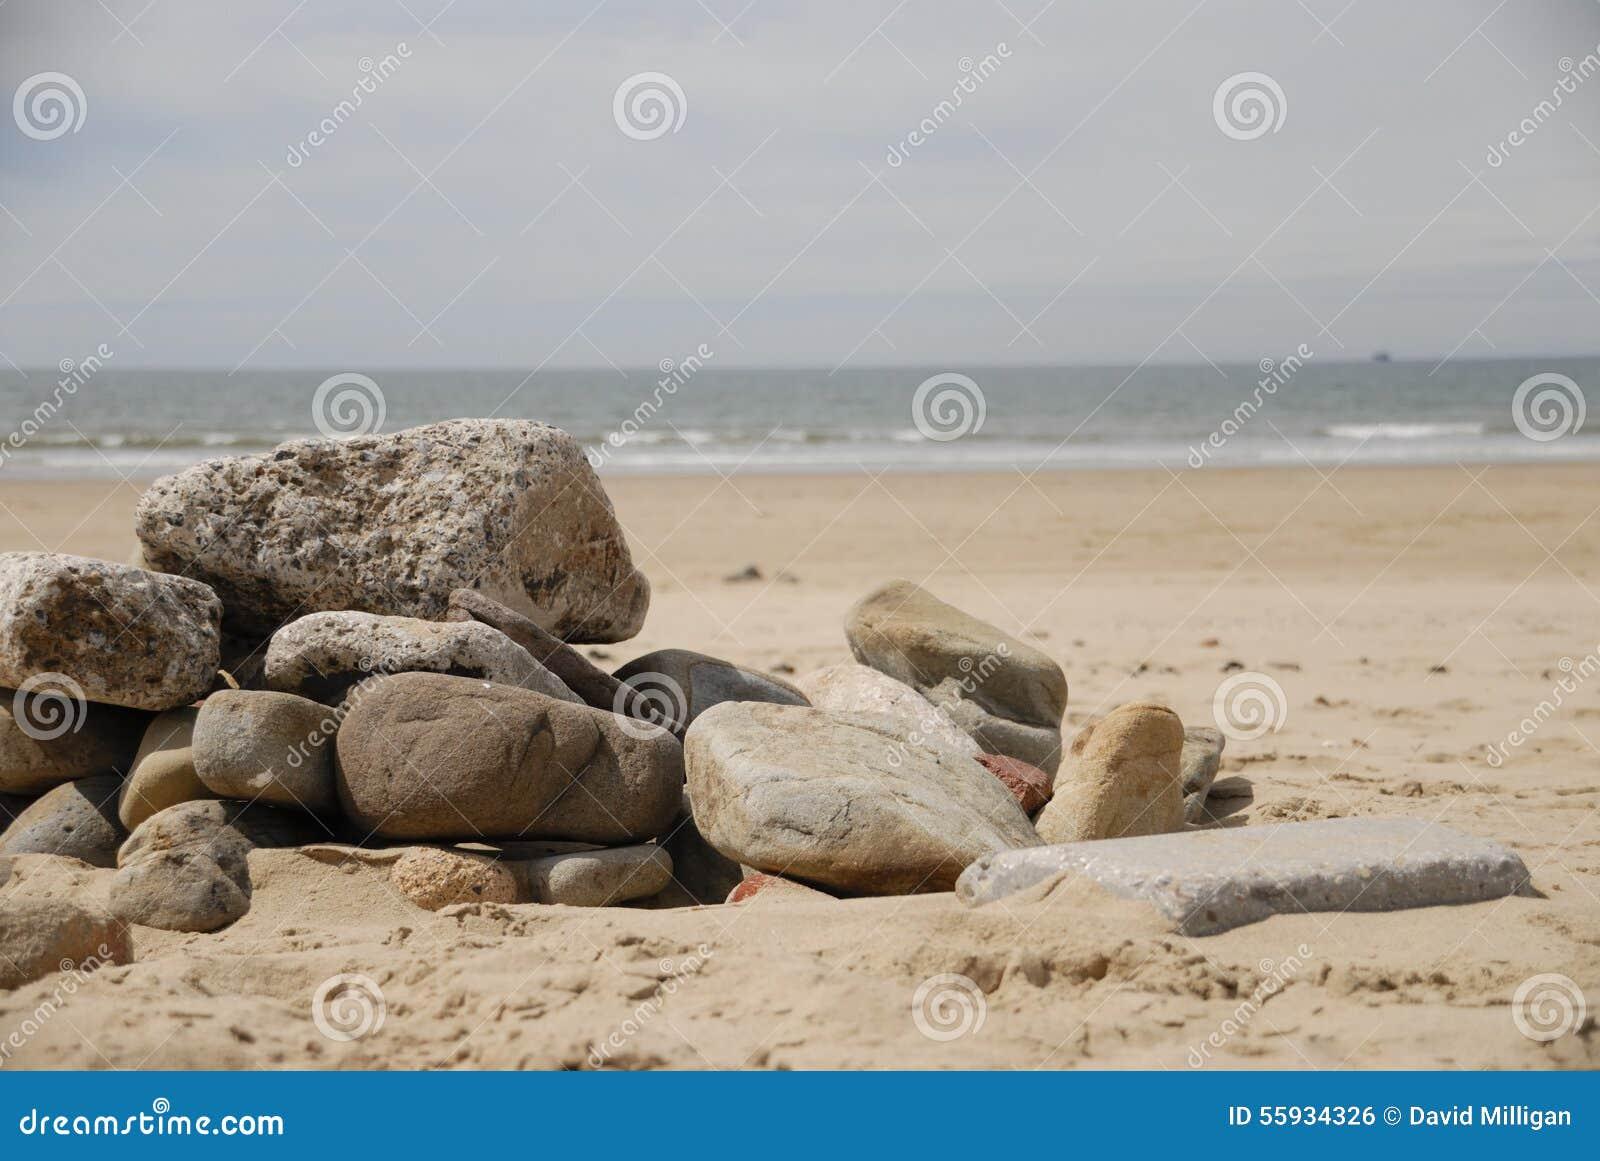 Rocks on sand at beach